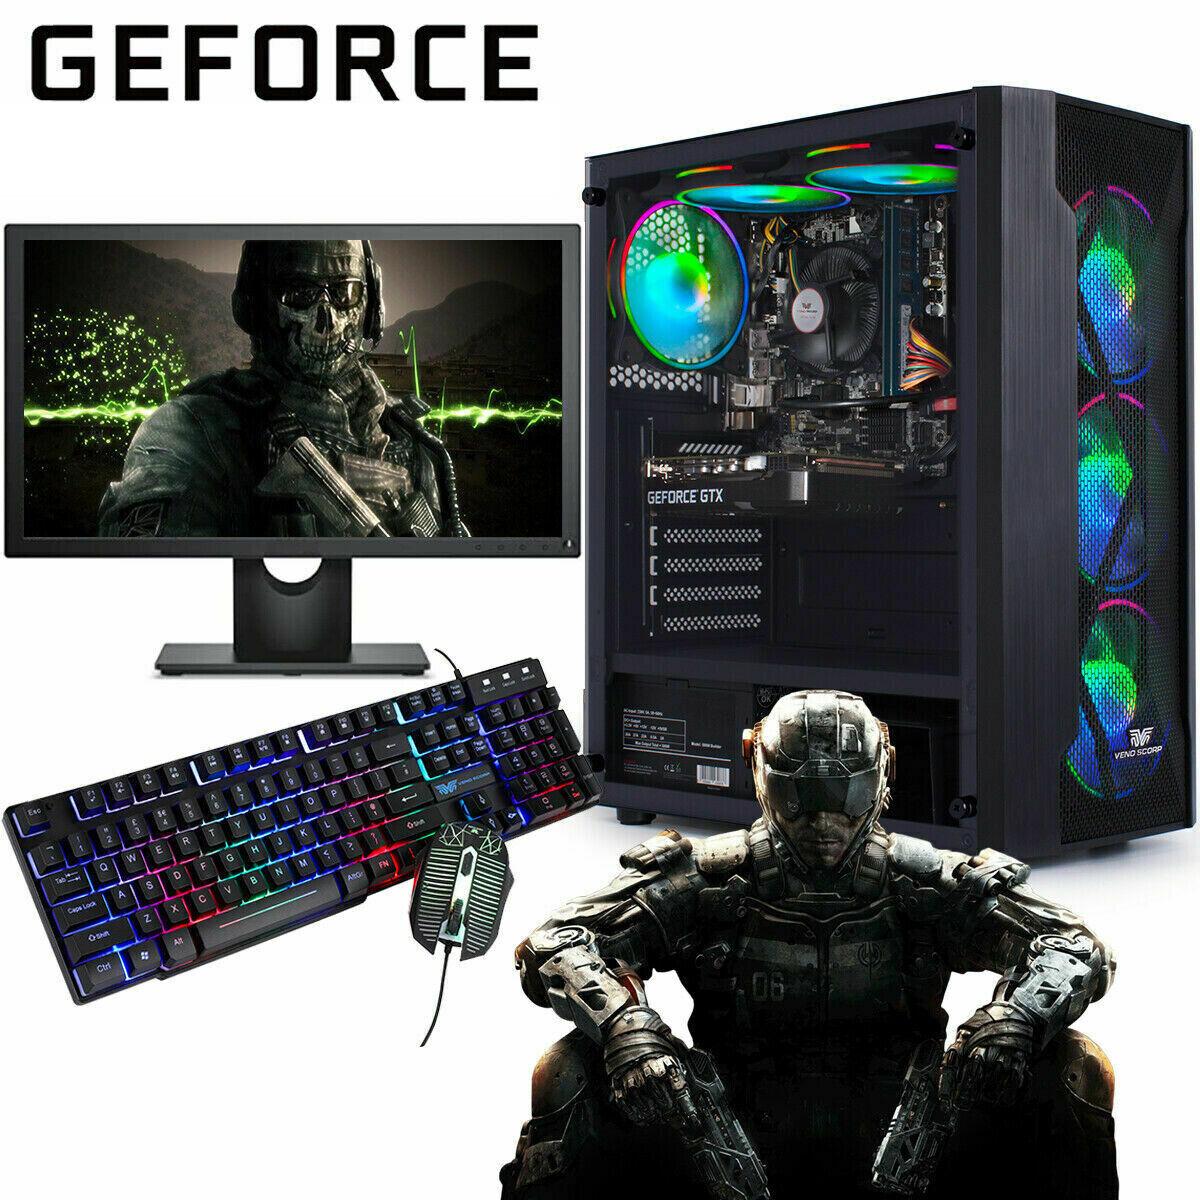 Computer Games - Fast Gaming PC Computer Bundle Intel Quad Core i5 16GB 1TB Win 10 2GB GT710